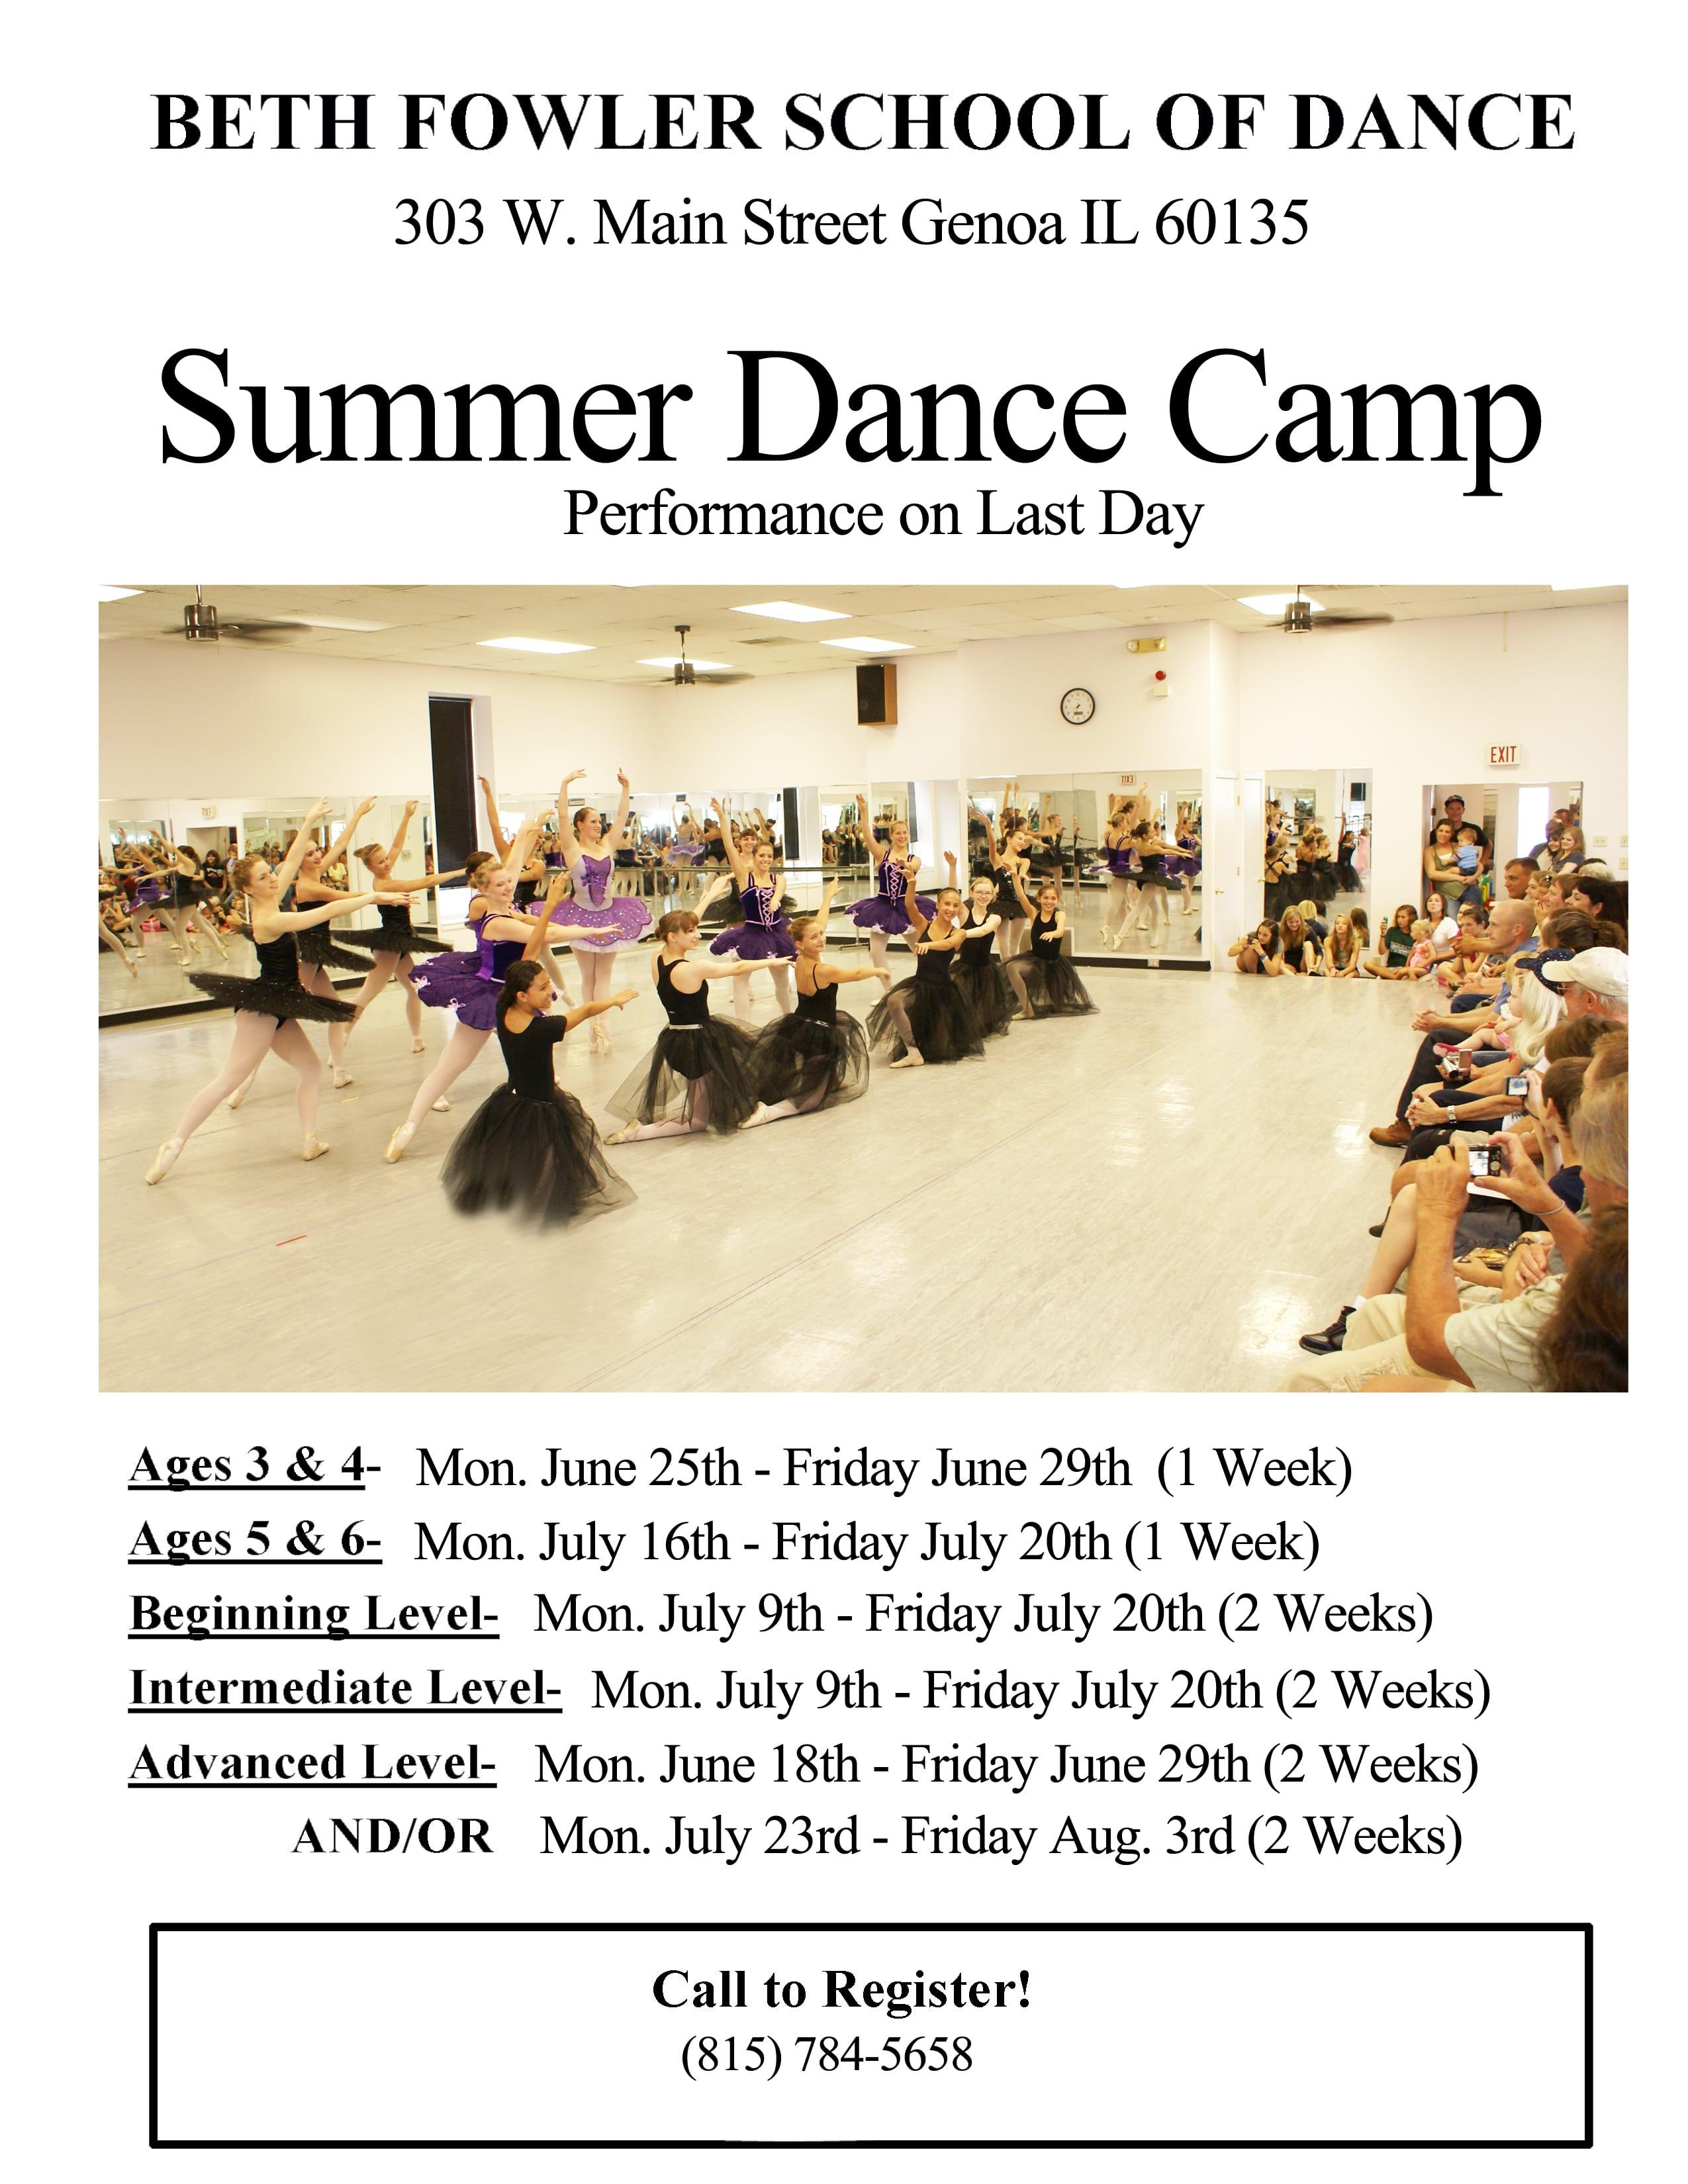 Summer Dance Camp Dates | DeKalb County Online